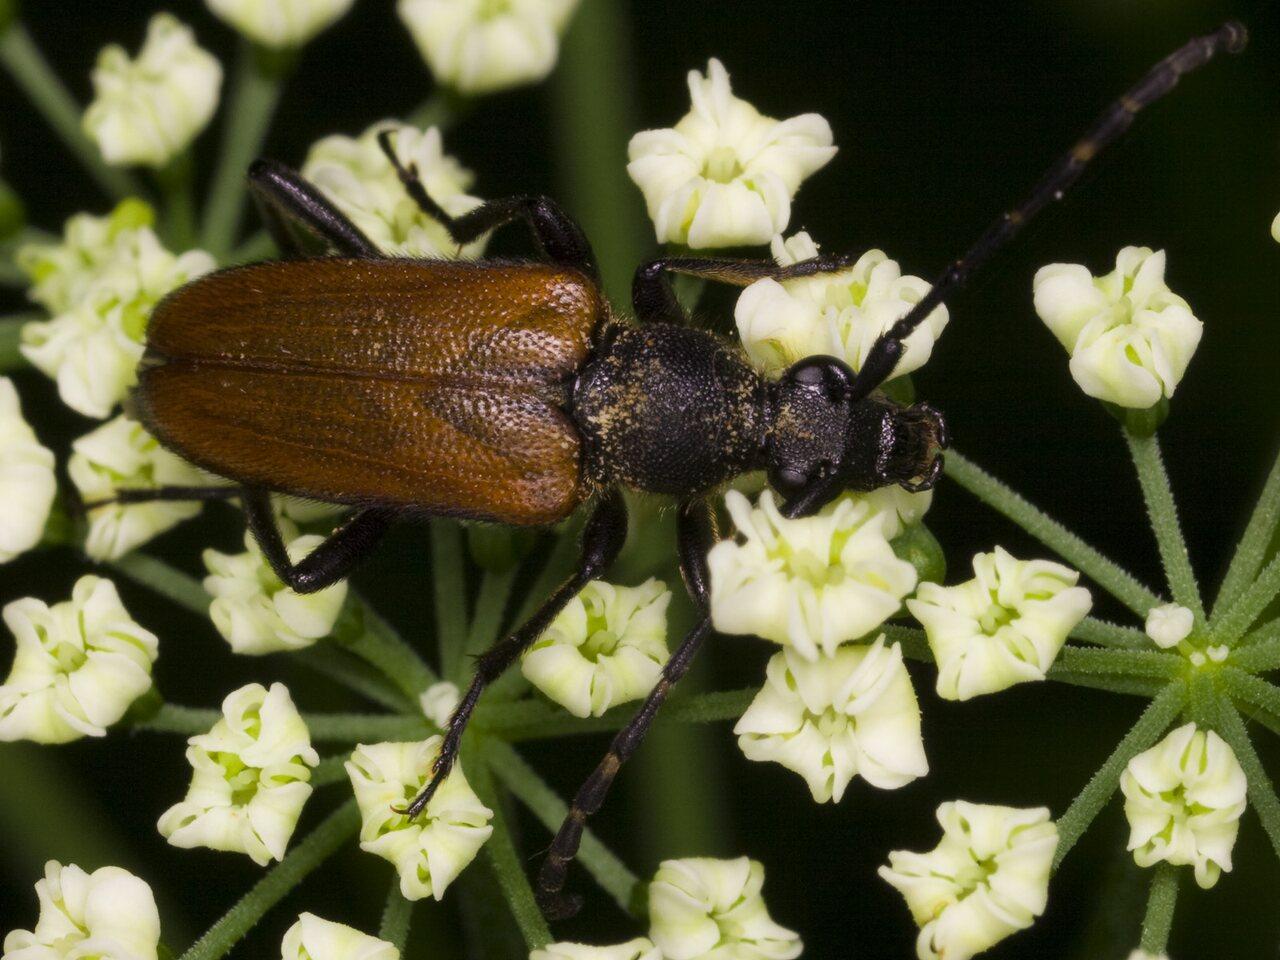 Paracorymbia-maculicornis-3357.jpg